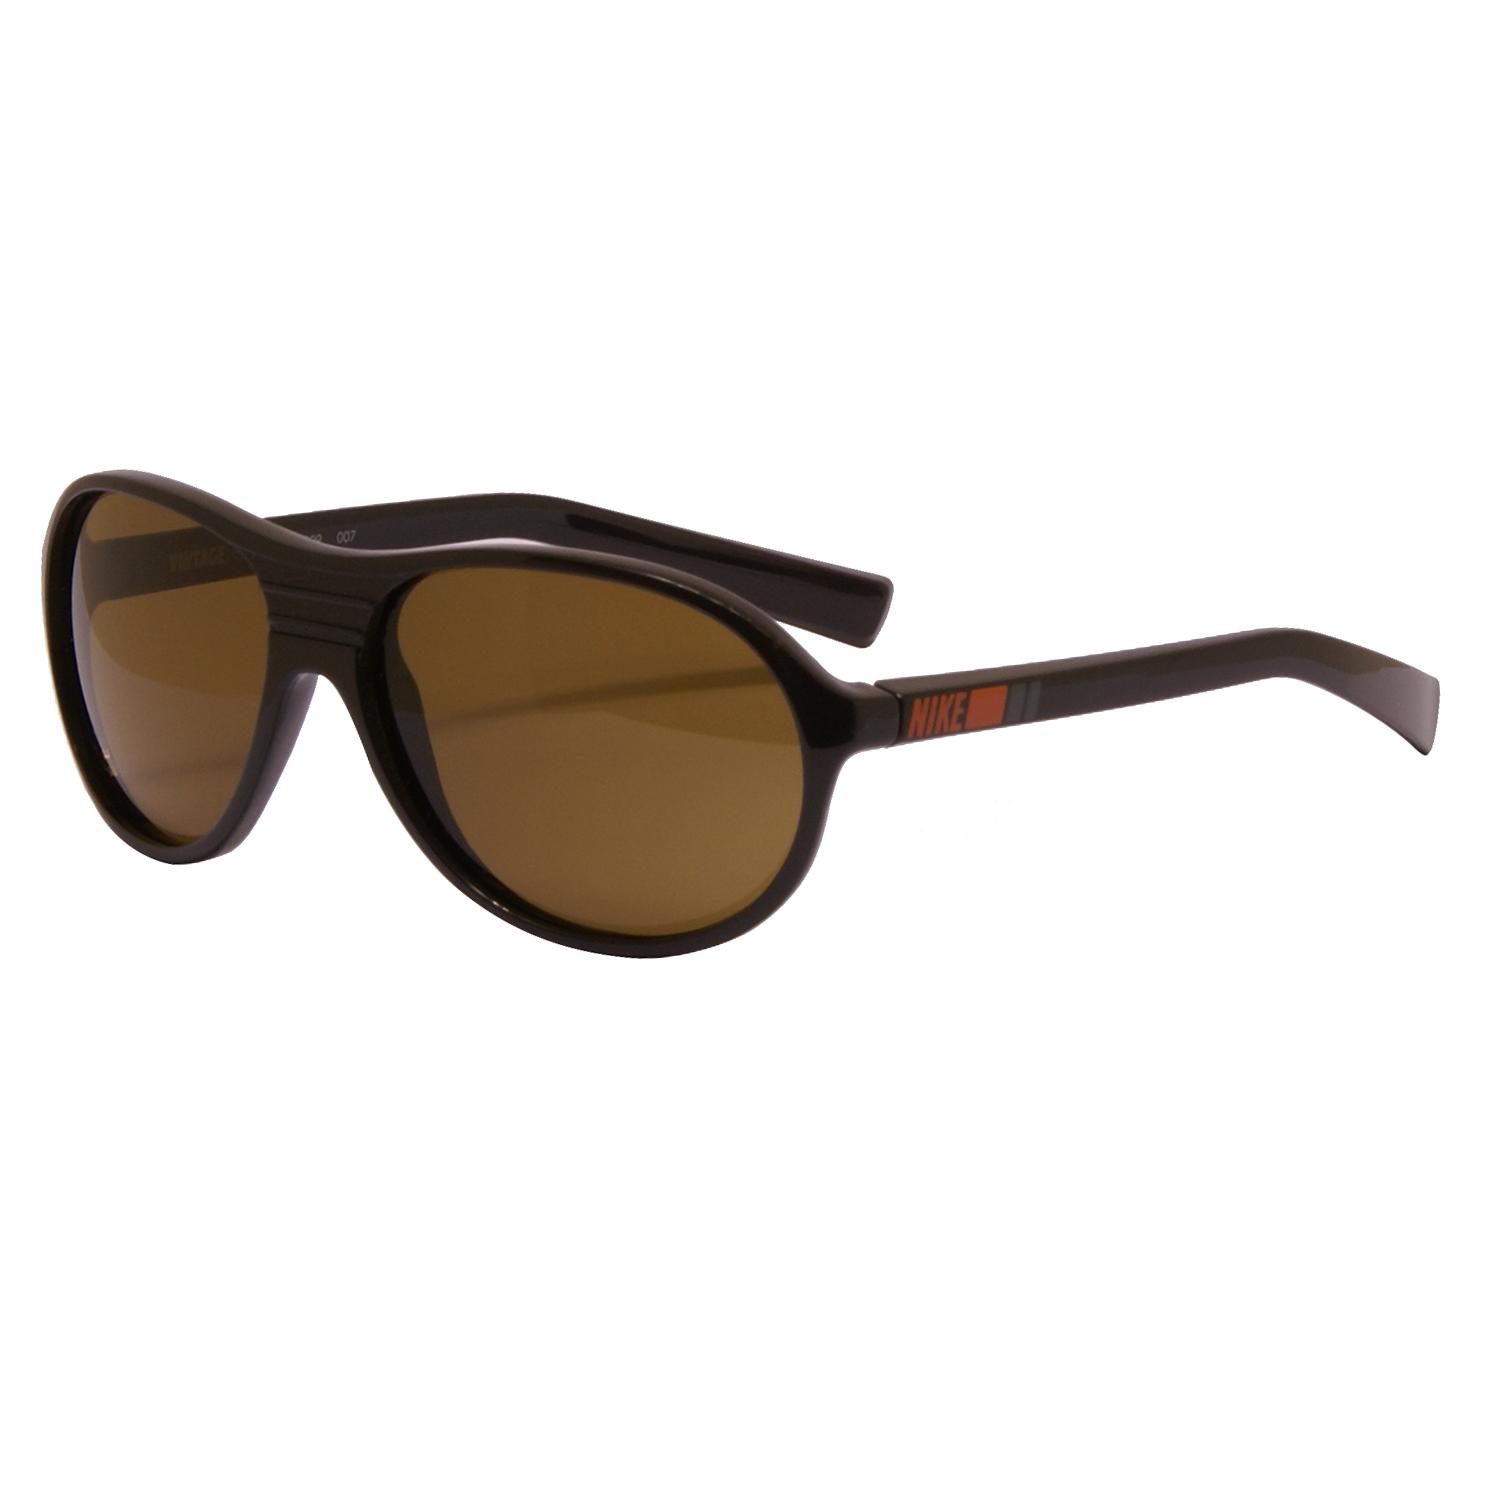 Nike – Vintage 74 Shiny Black Stripe Retro Classic Sunglasses with Vintage Case